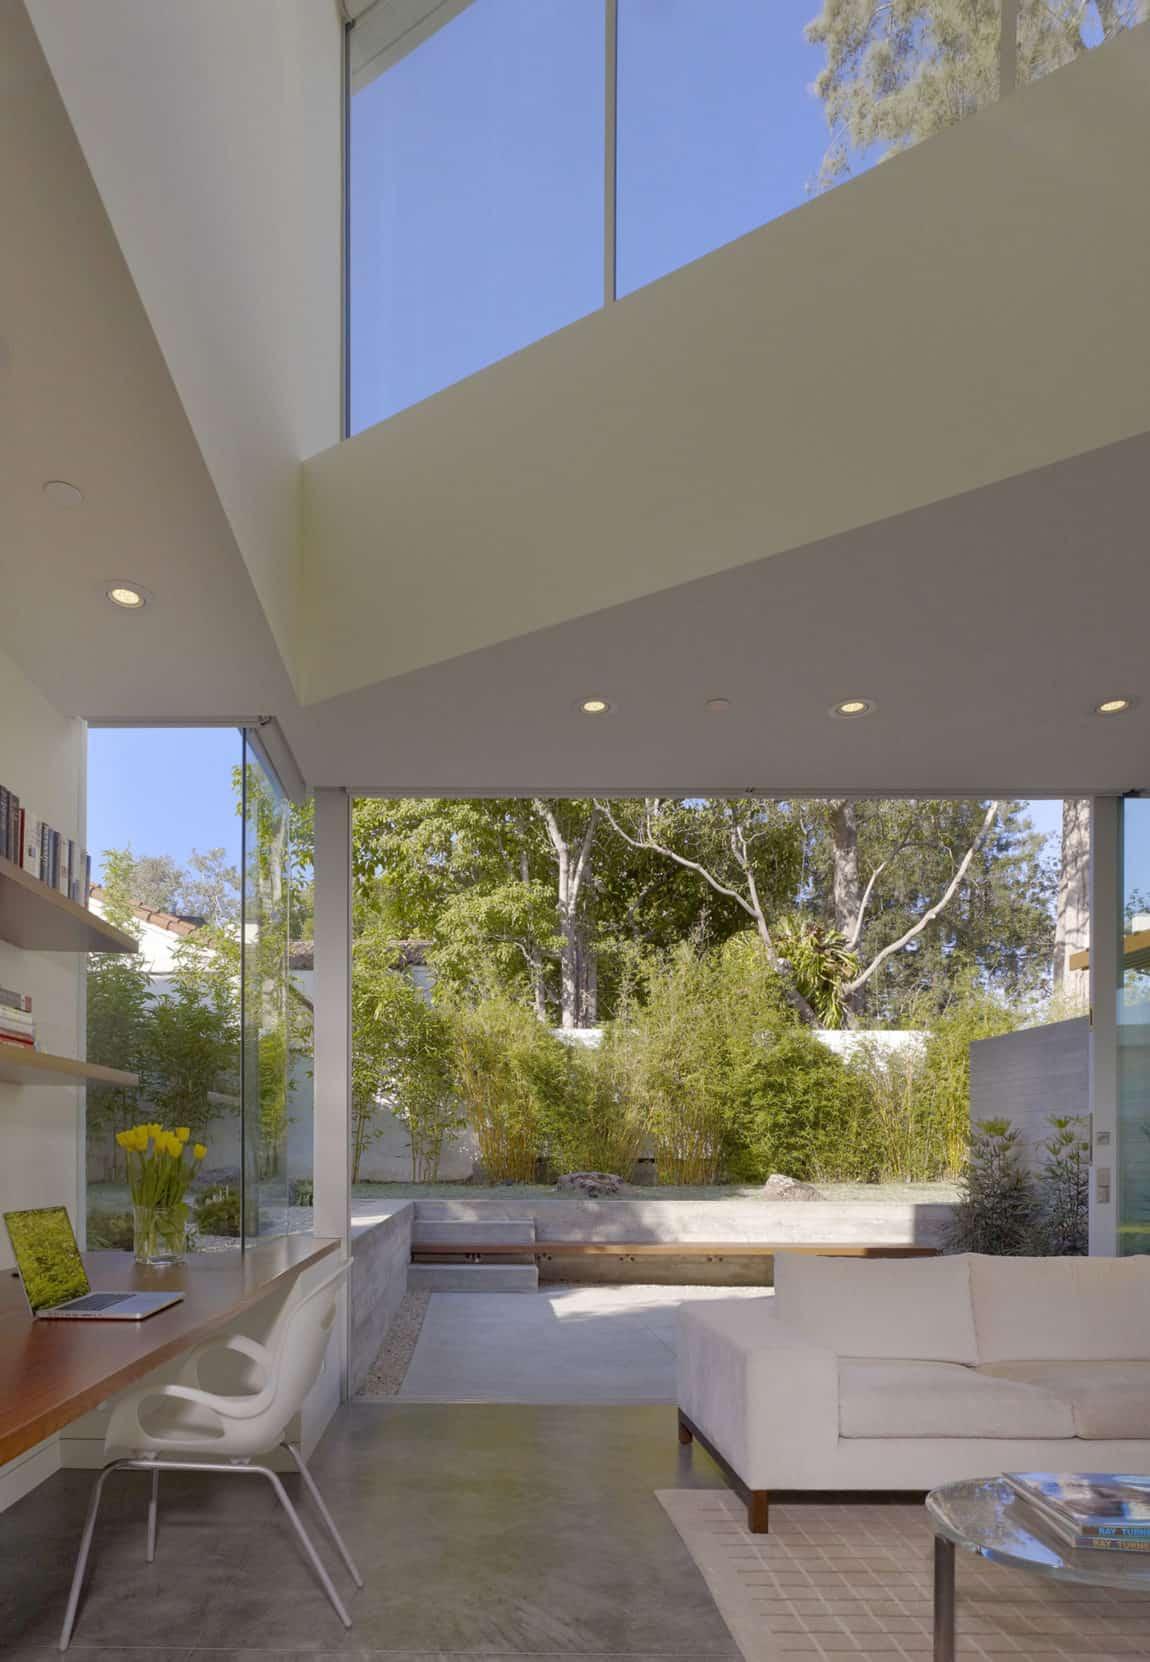 Ehrlich Retreat + by John Friedman Alice Kimm Architects (10)